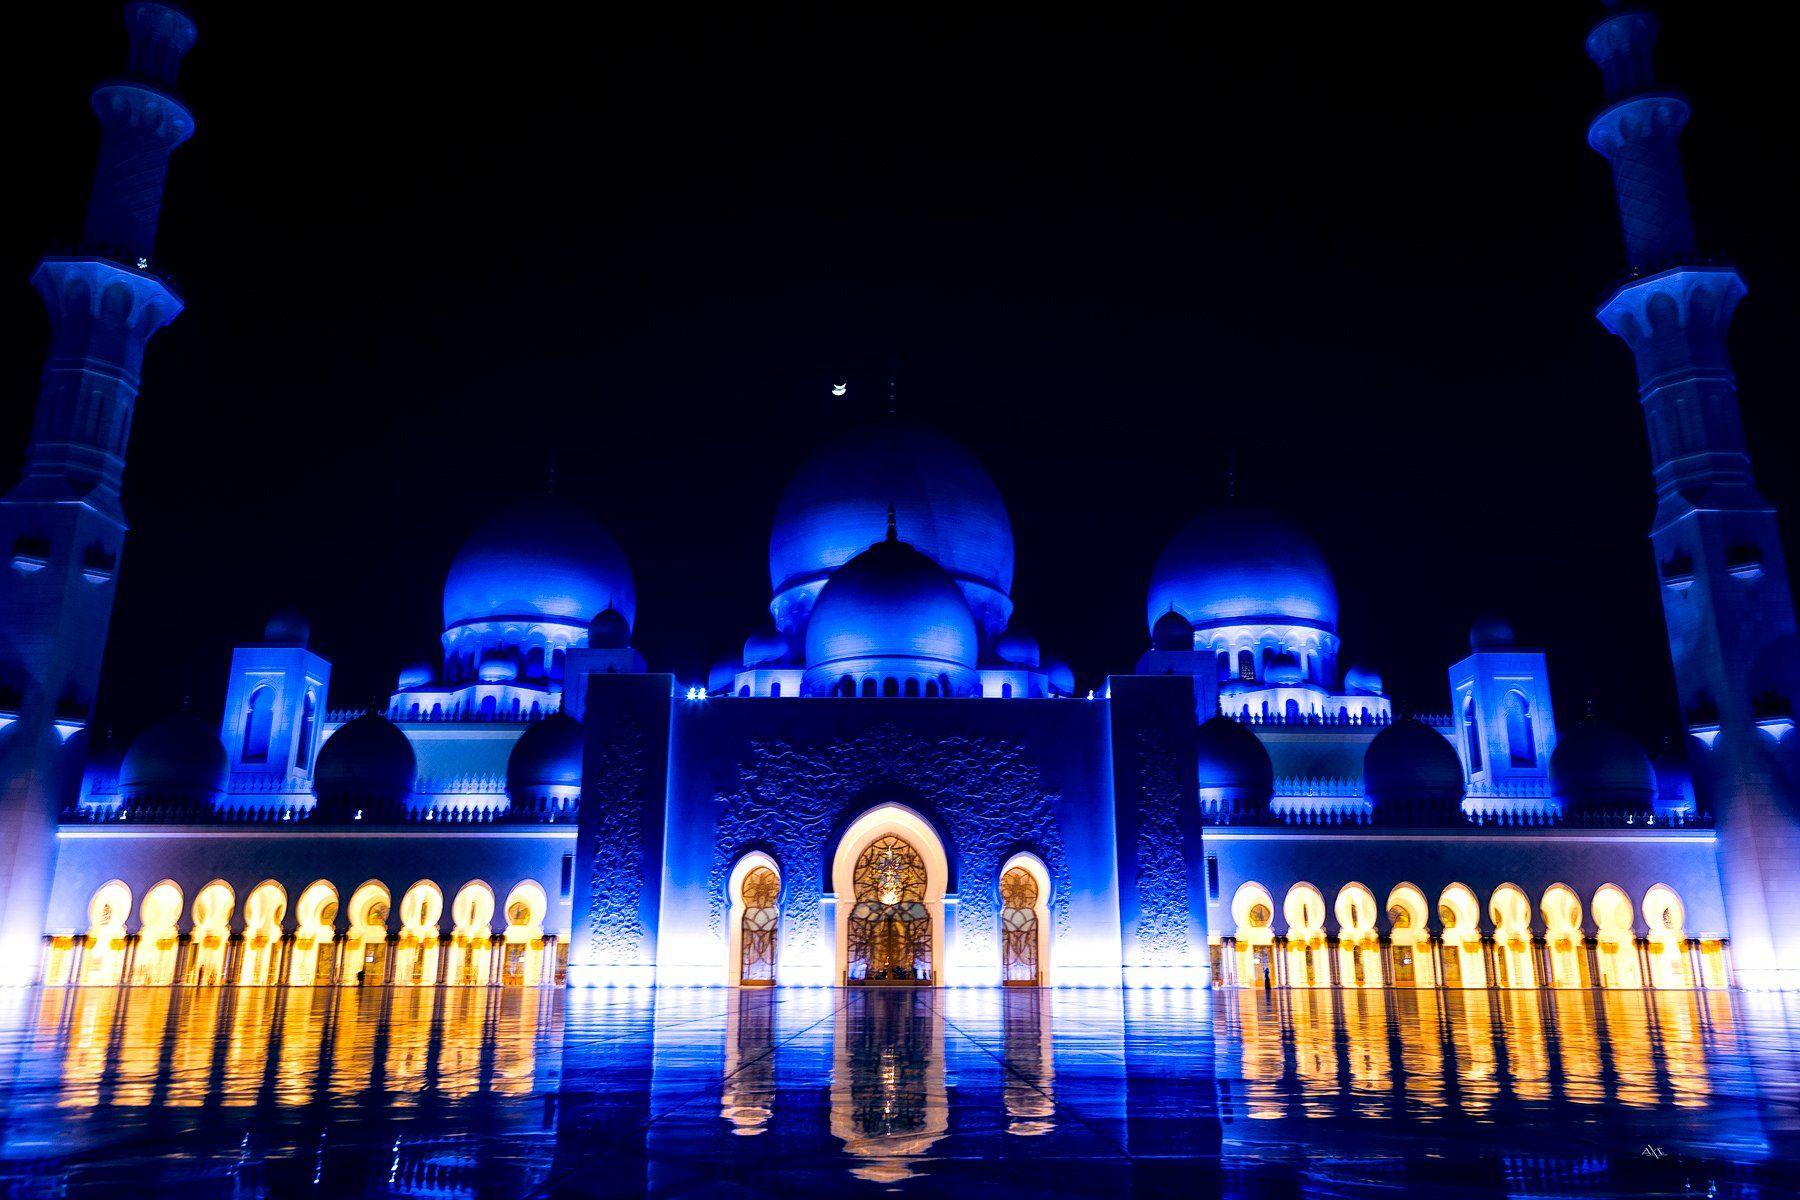 mosque, uae, abu dabi, travel, cityscape, Руслан Болгов (Axe)